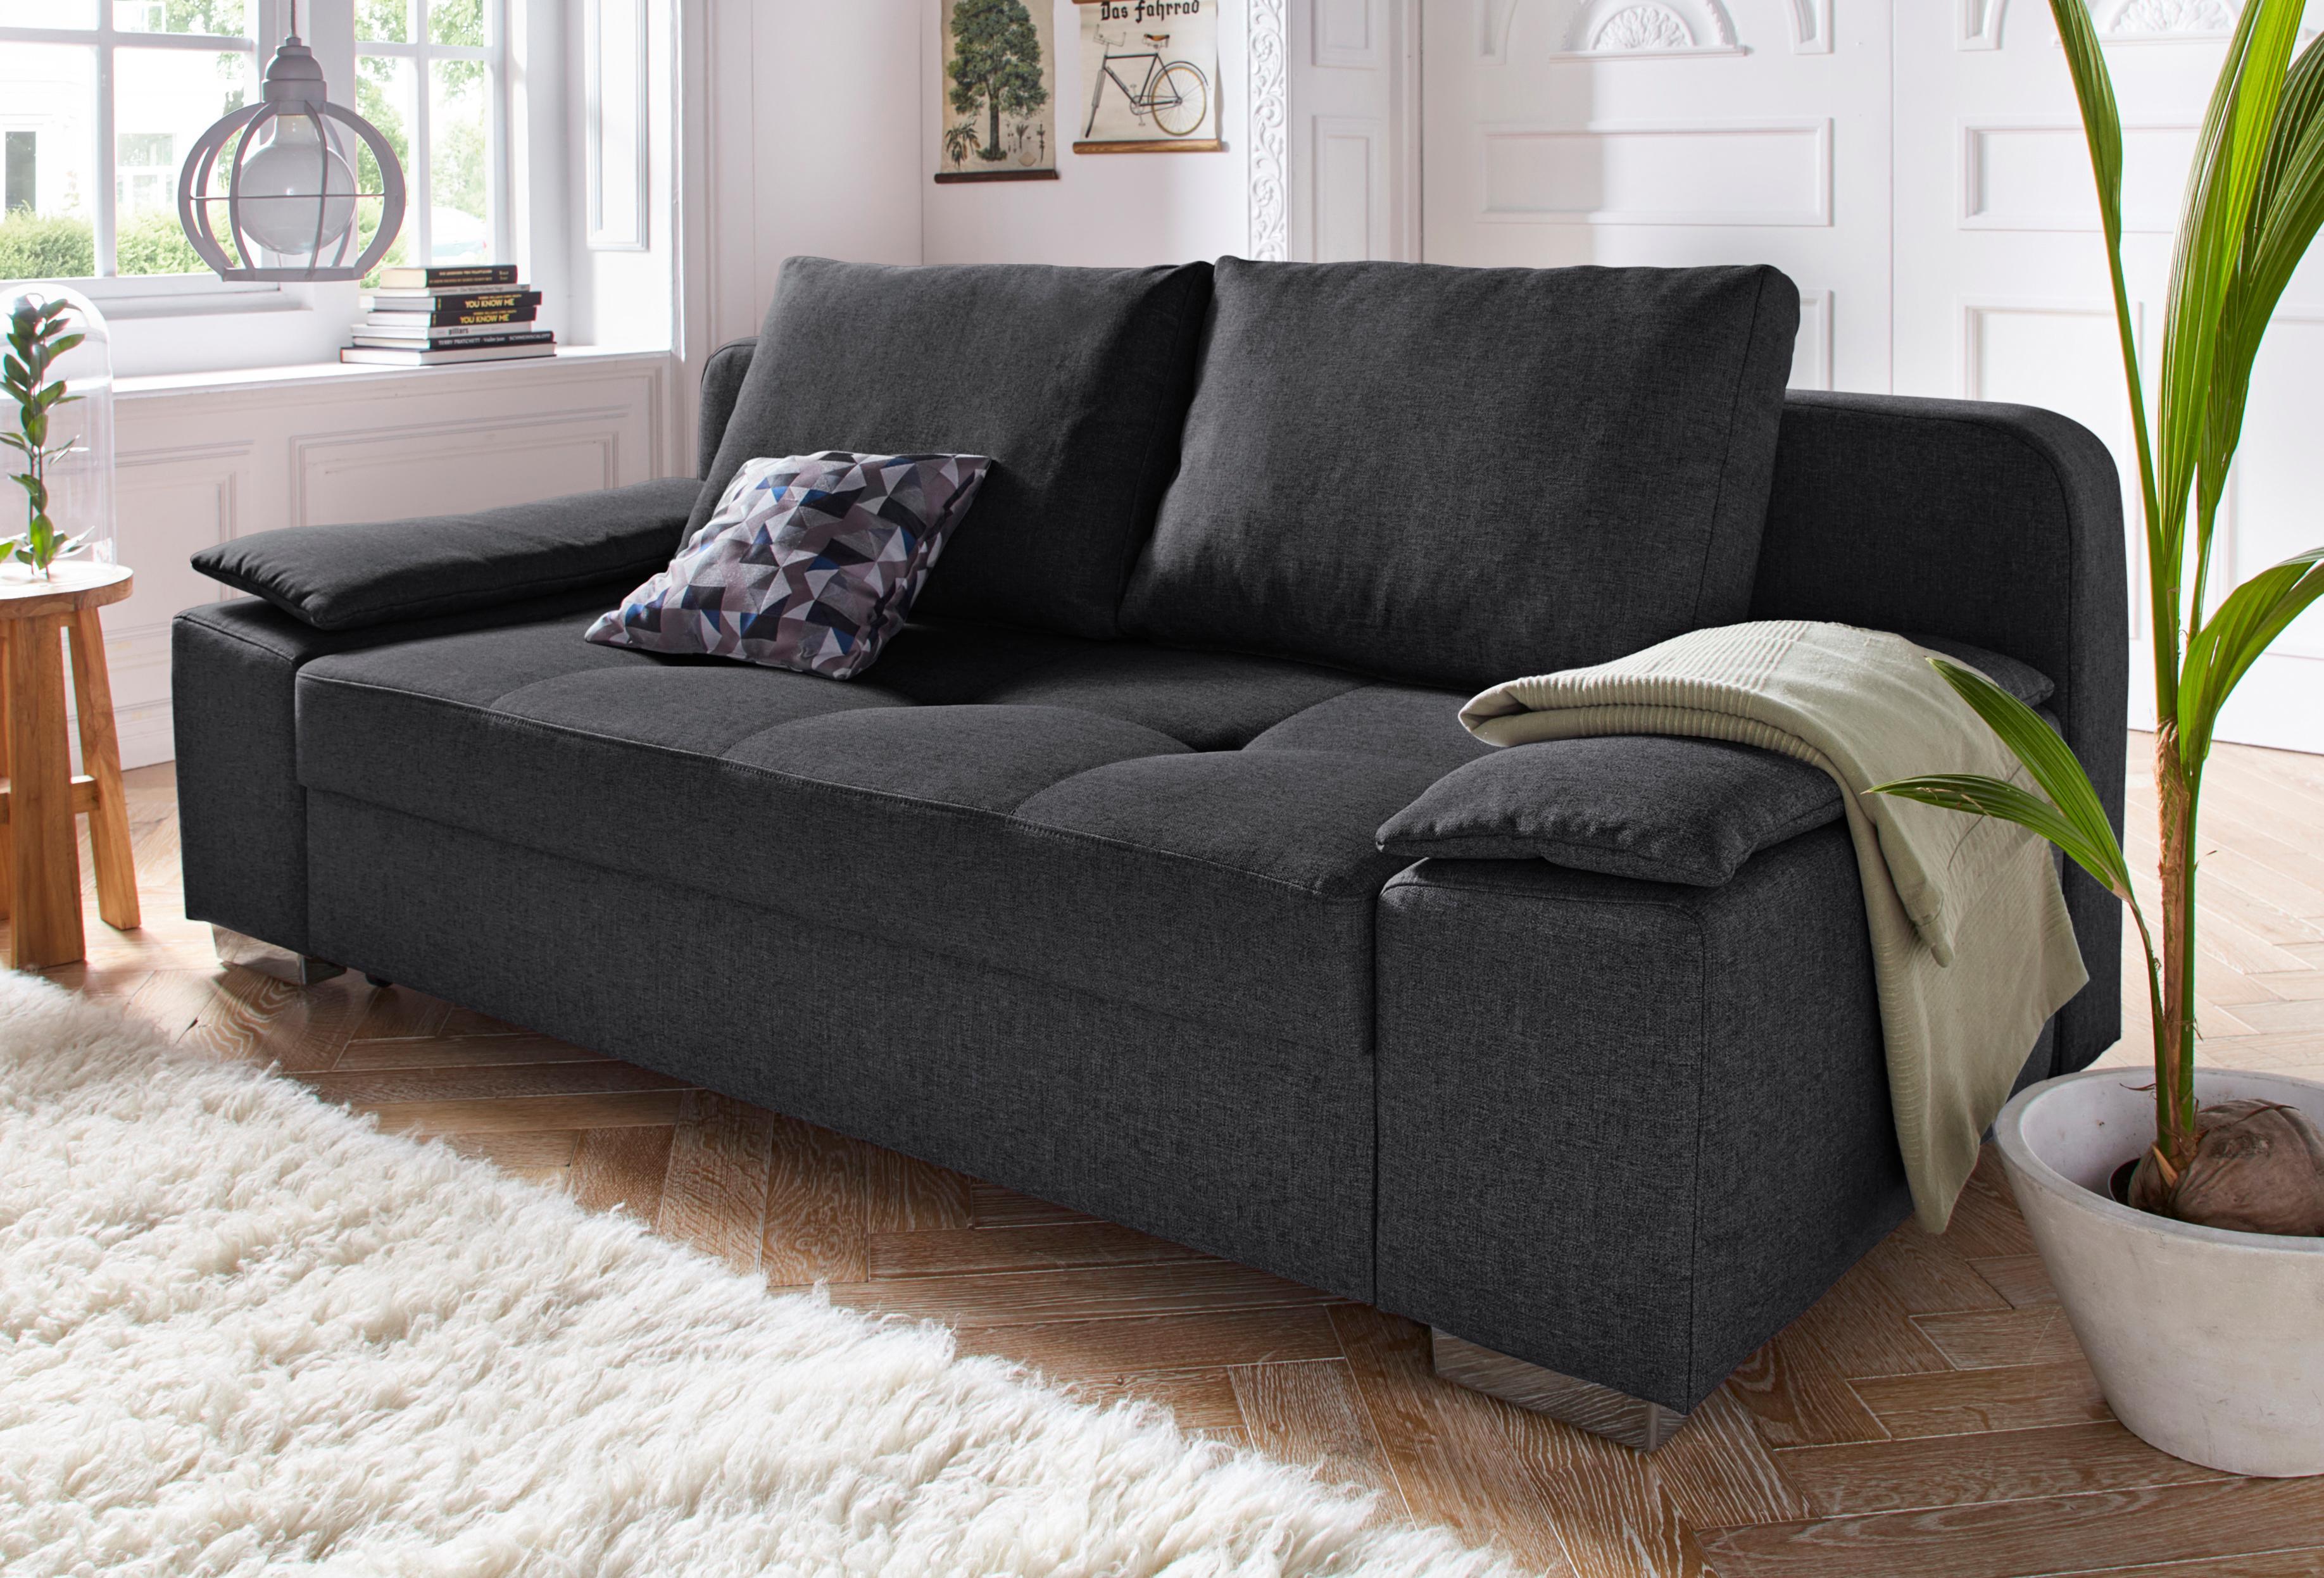 collection ab schlafsofa kaufen baur. Black Bedroom Furniture Sets. Home Design Ideas